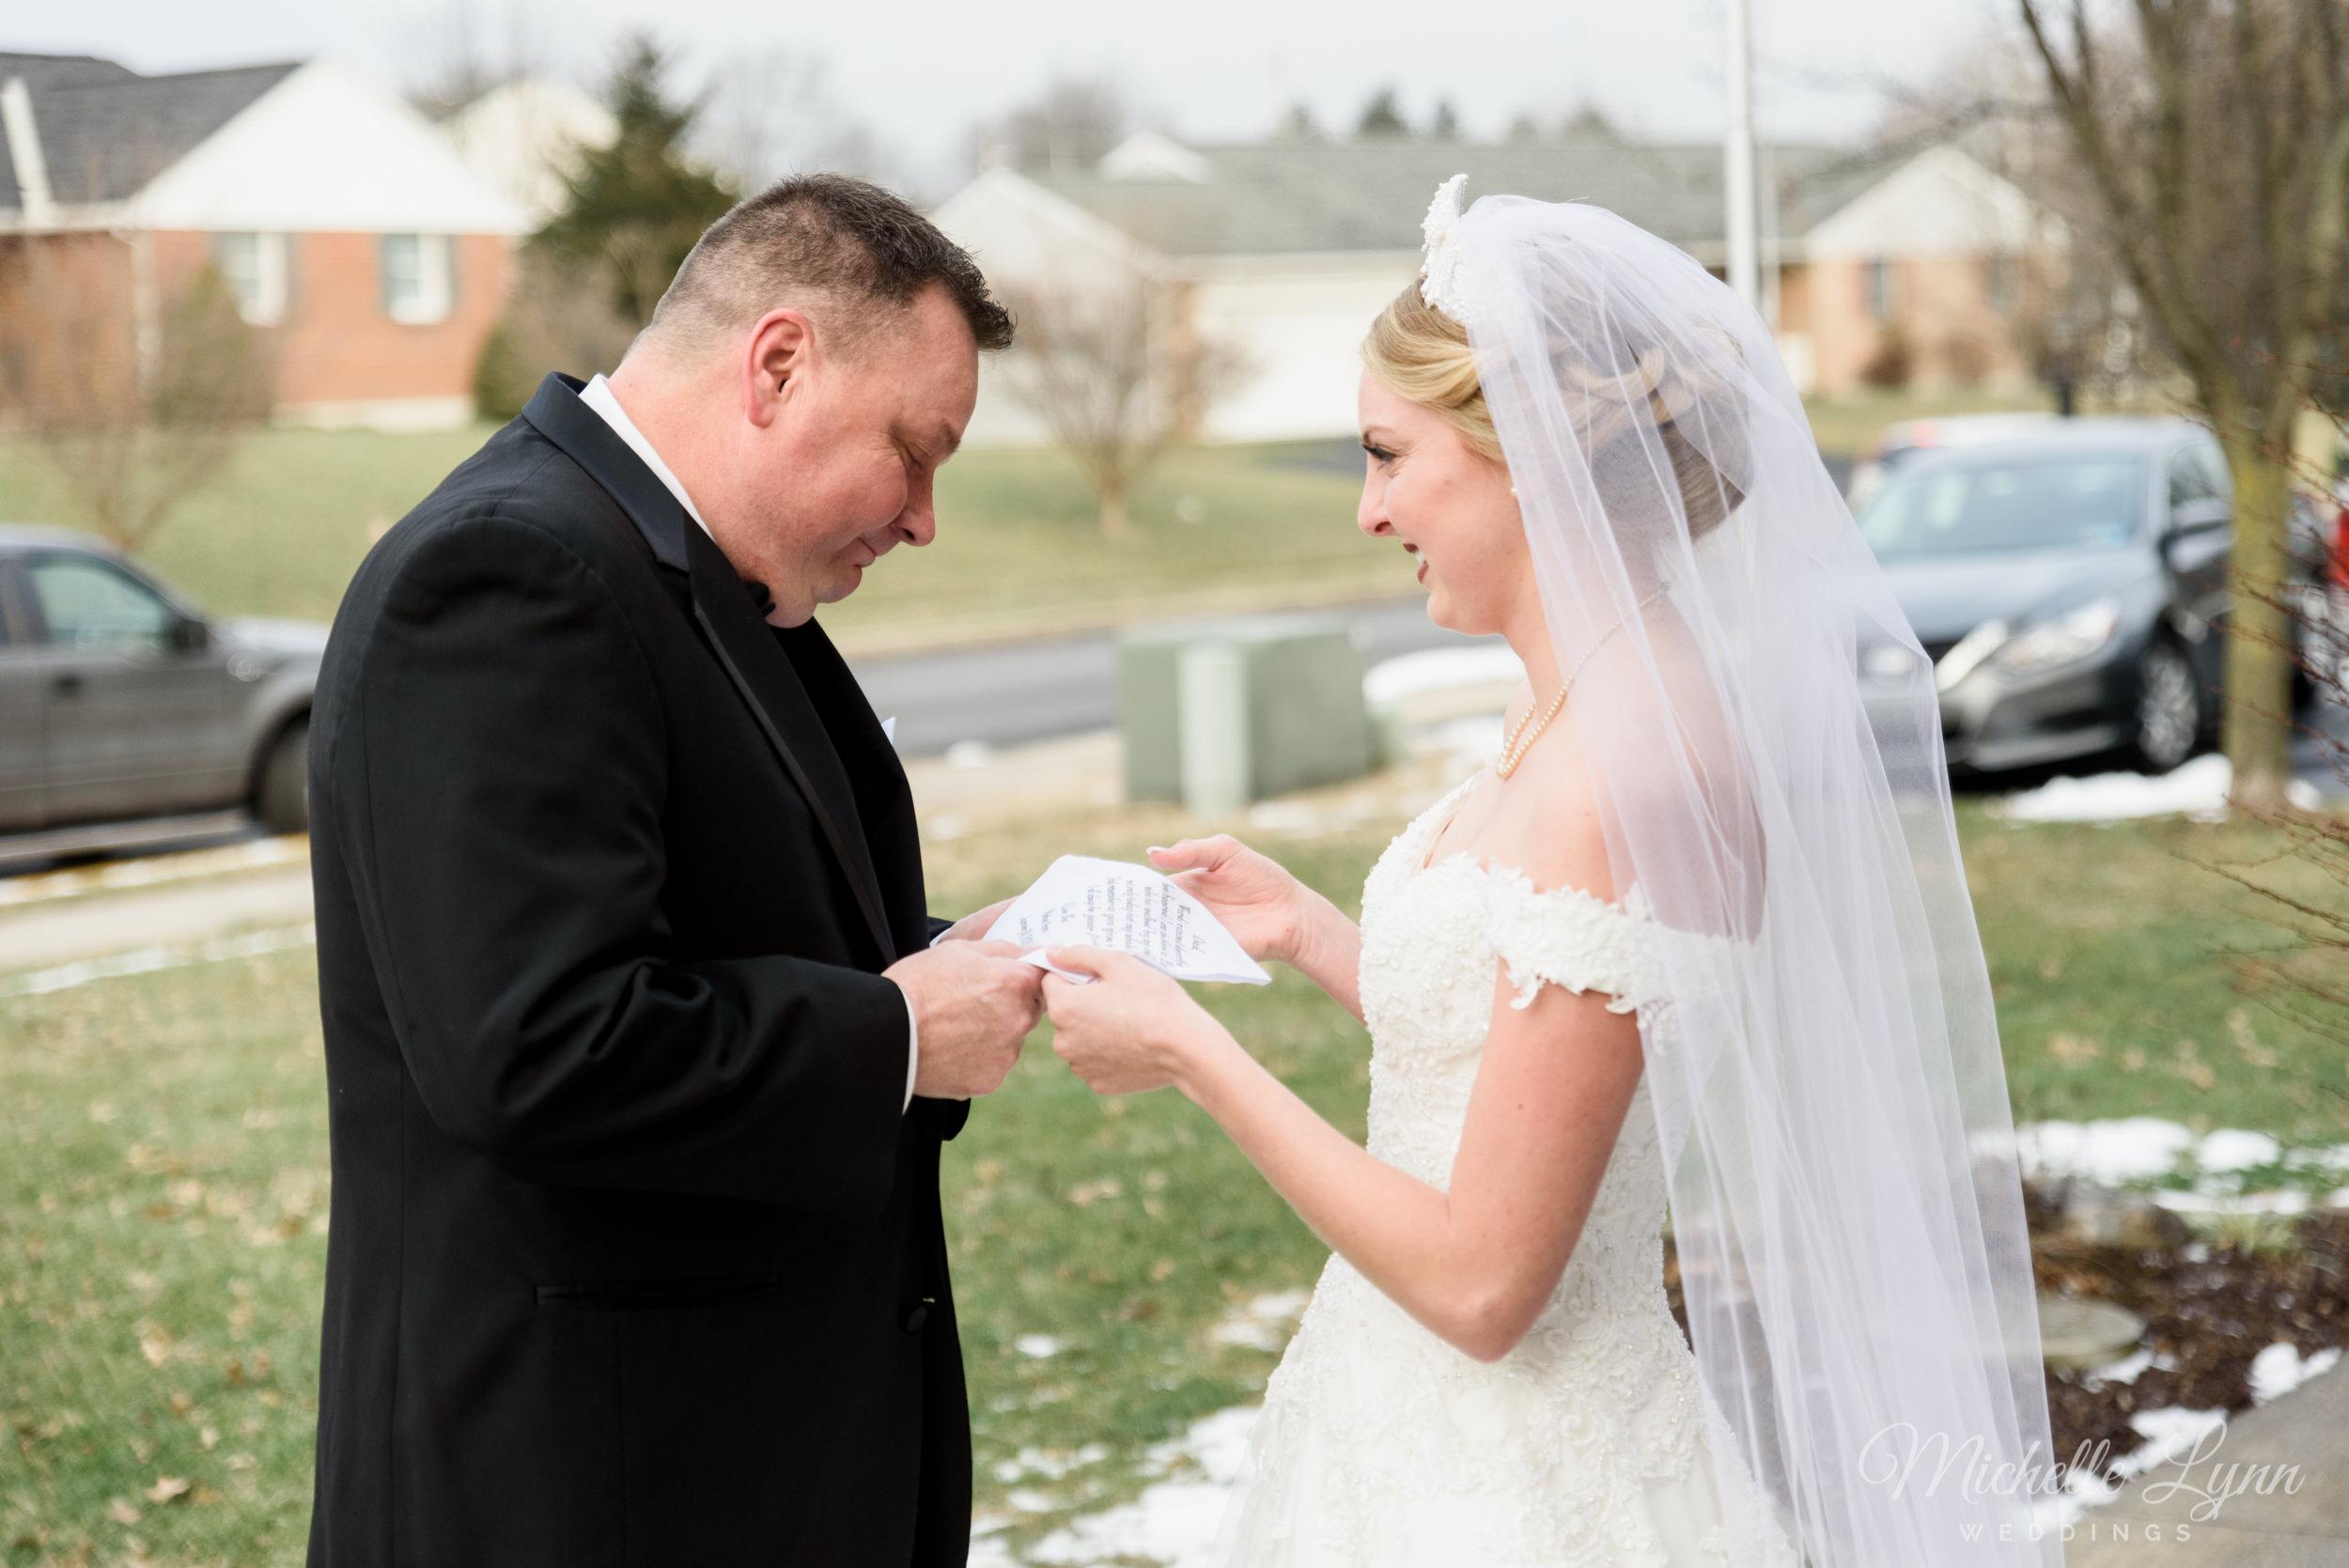 william-penn-inn-wedding-photography-mlw-22.jpg